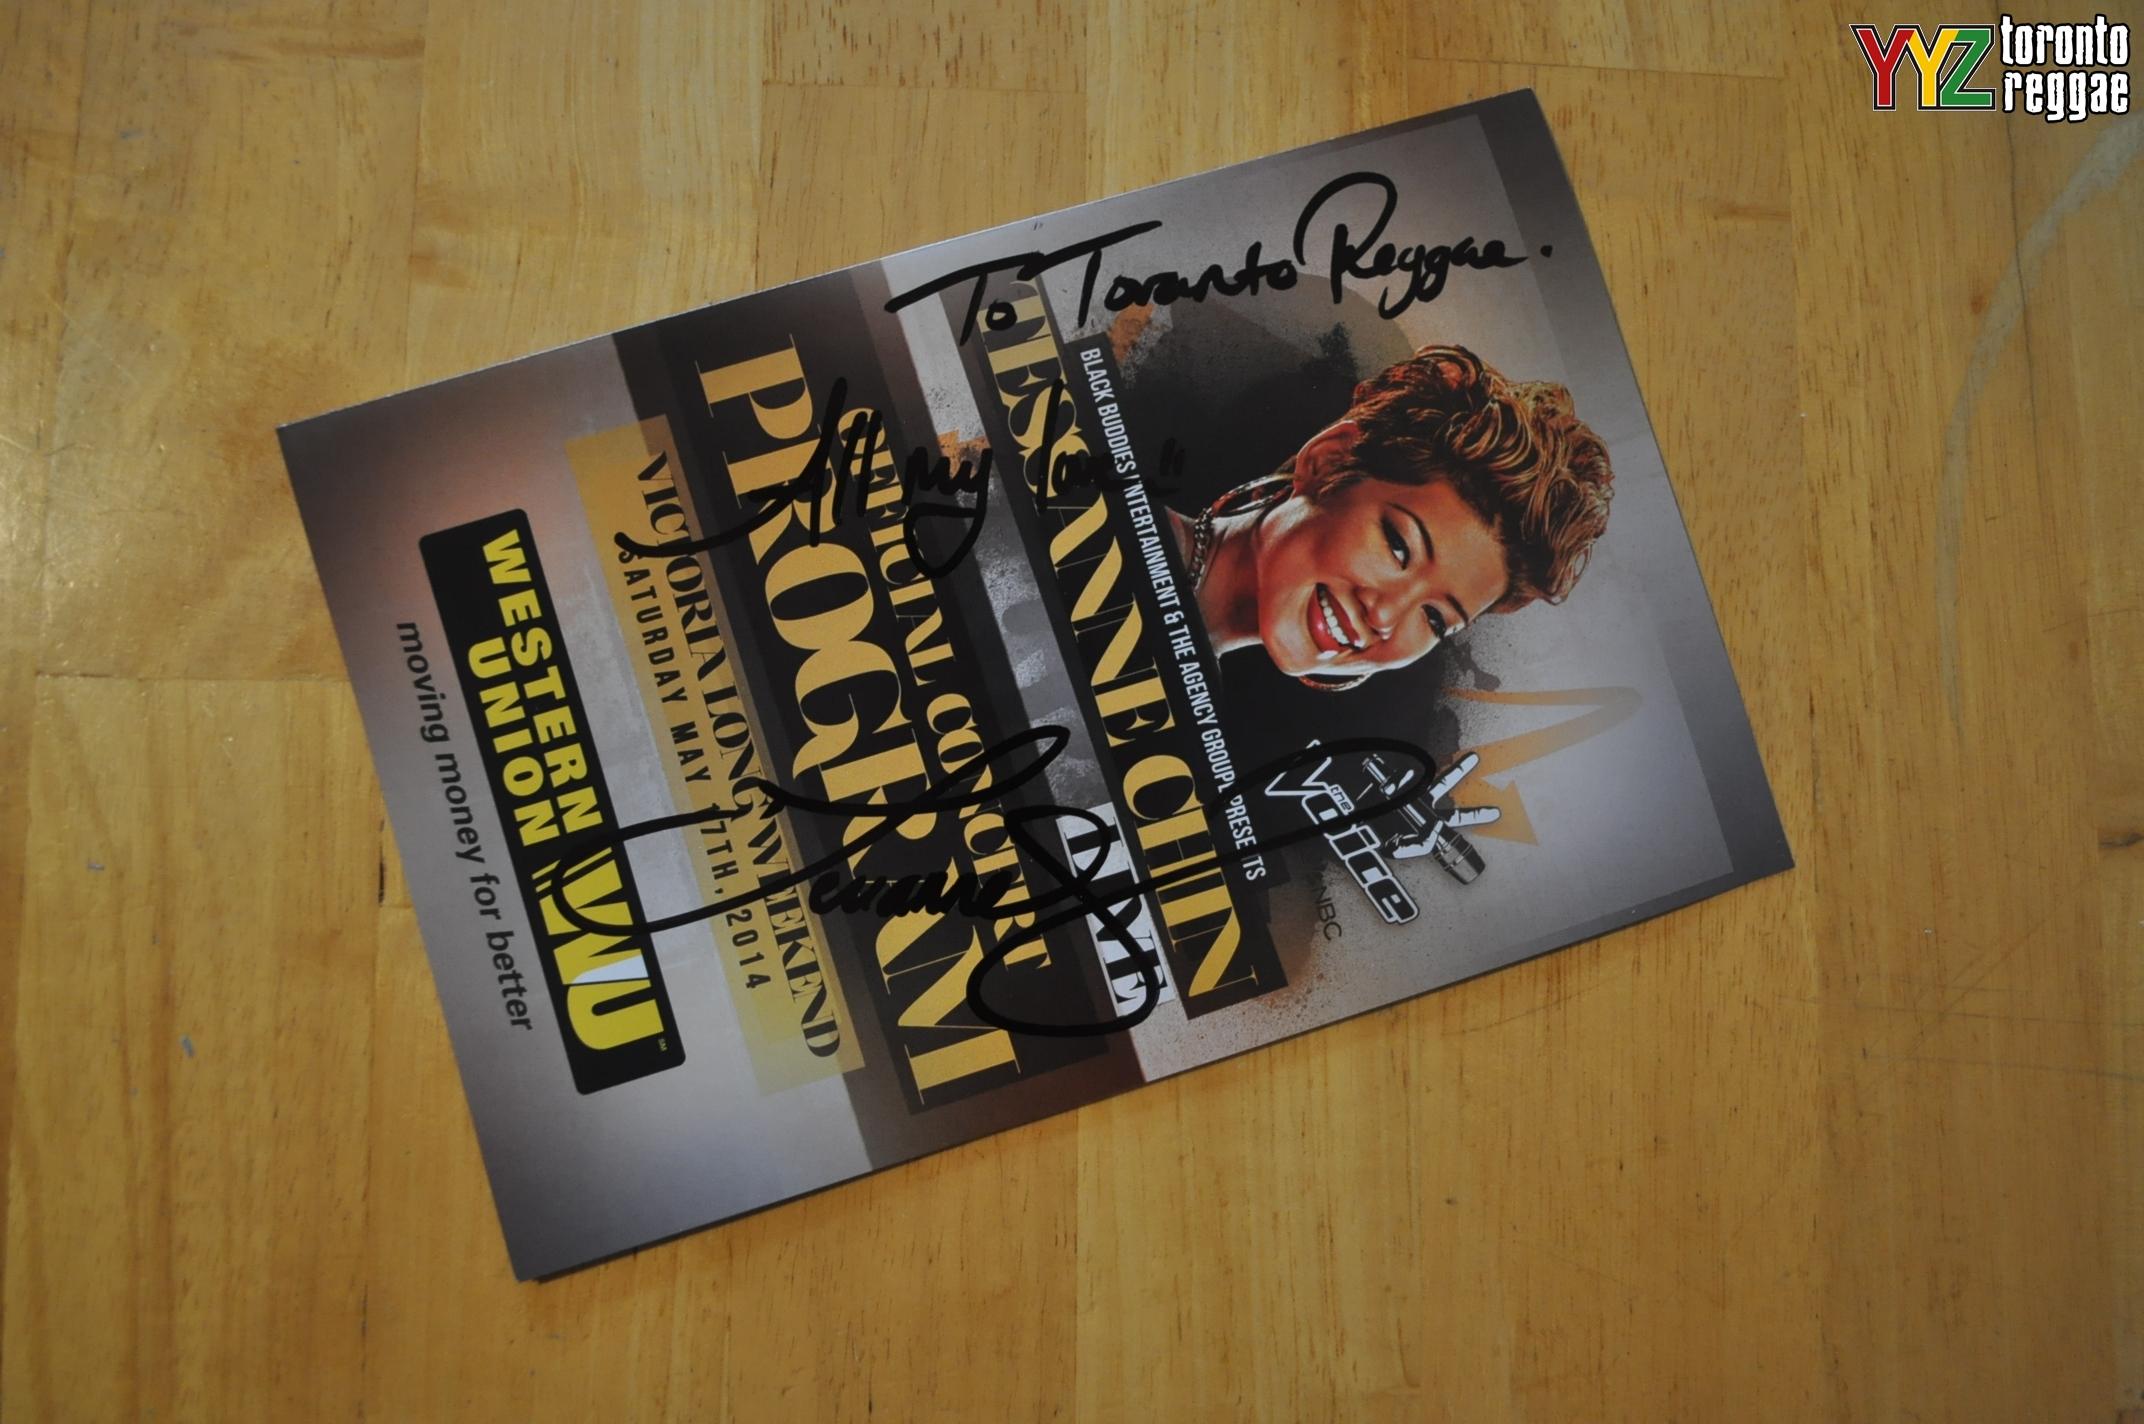 Tessanne Autograph for Toronto Reggae!